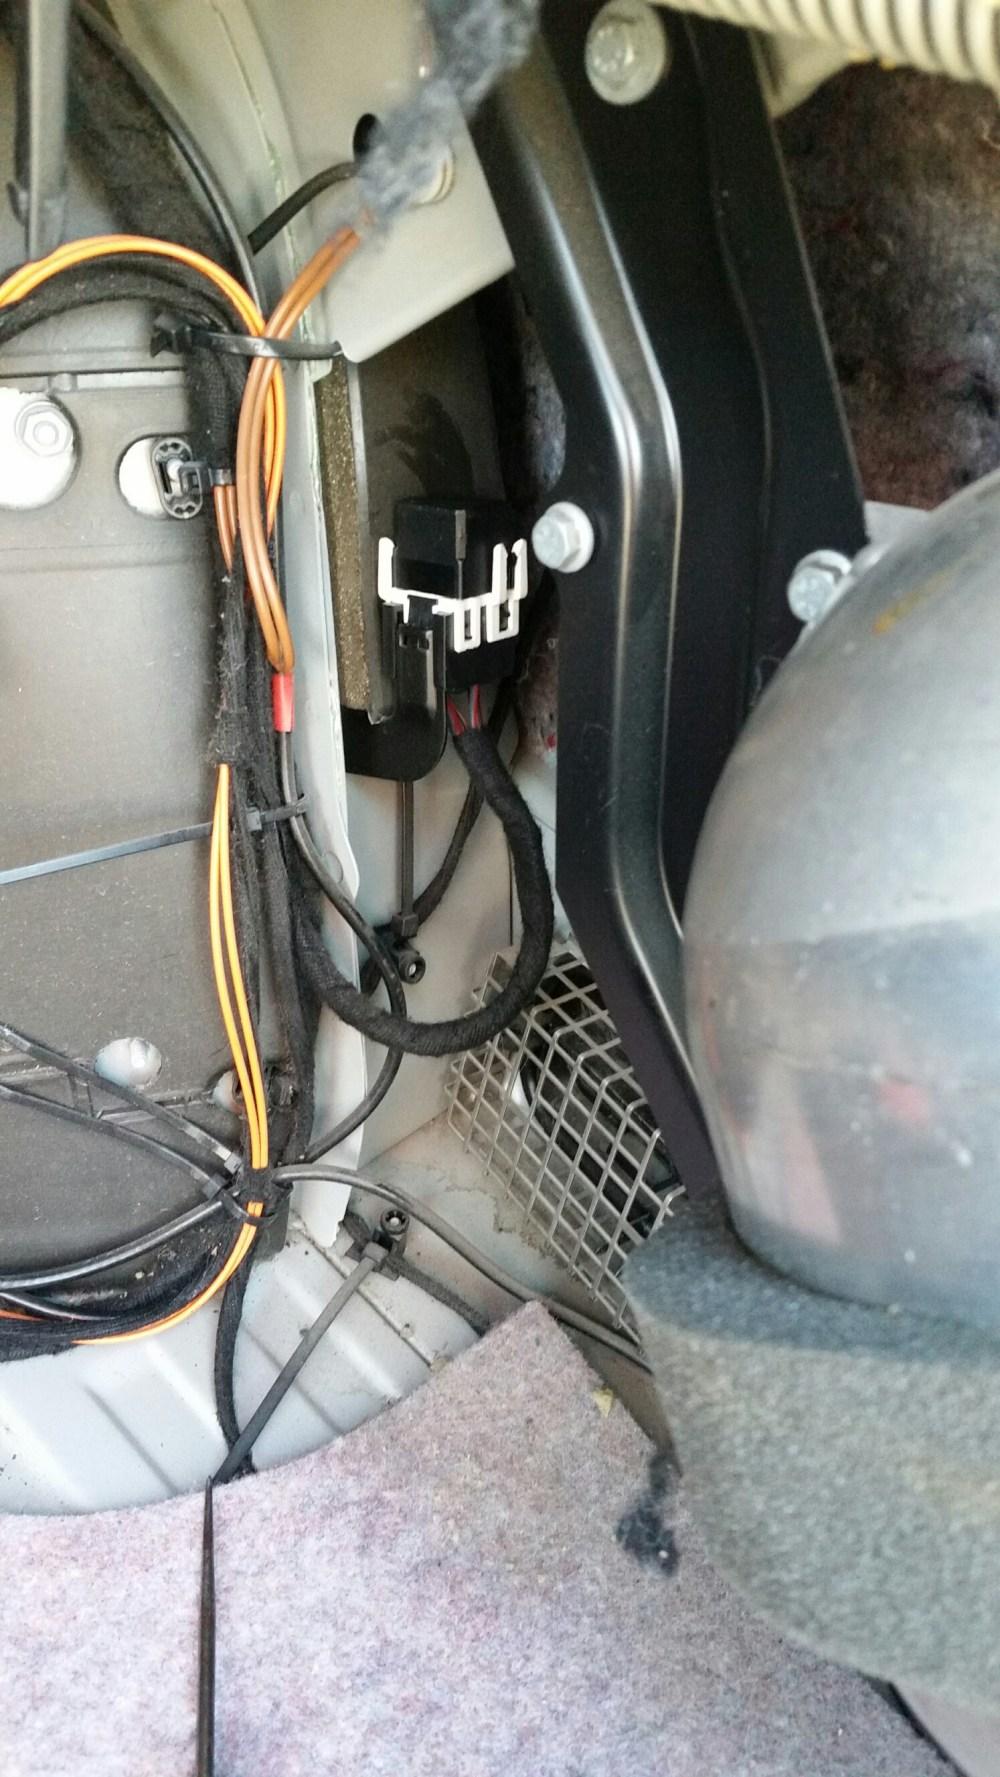 medium resolution of 05 e55 fuel pump wiring harness wiring diagram mercedes benz fuel pump wiring harness